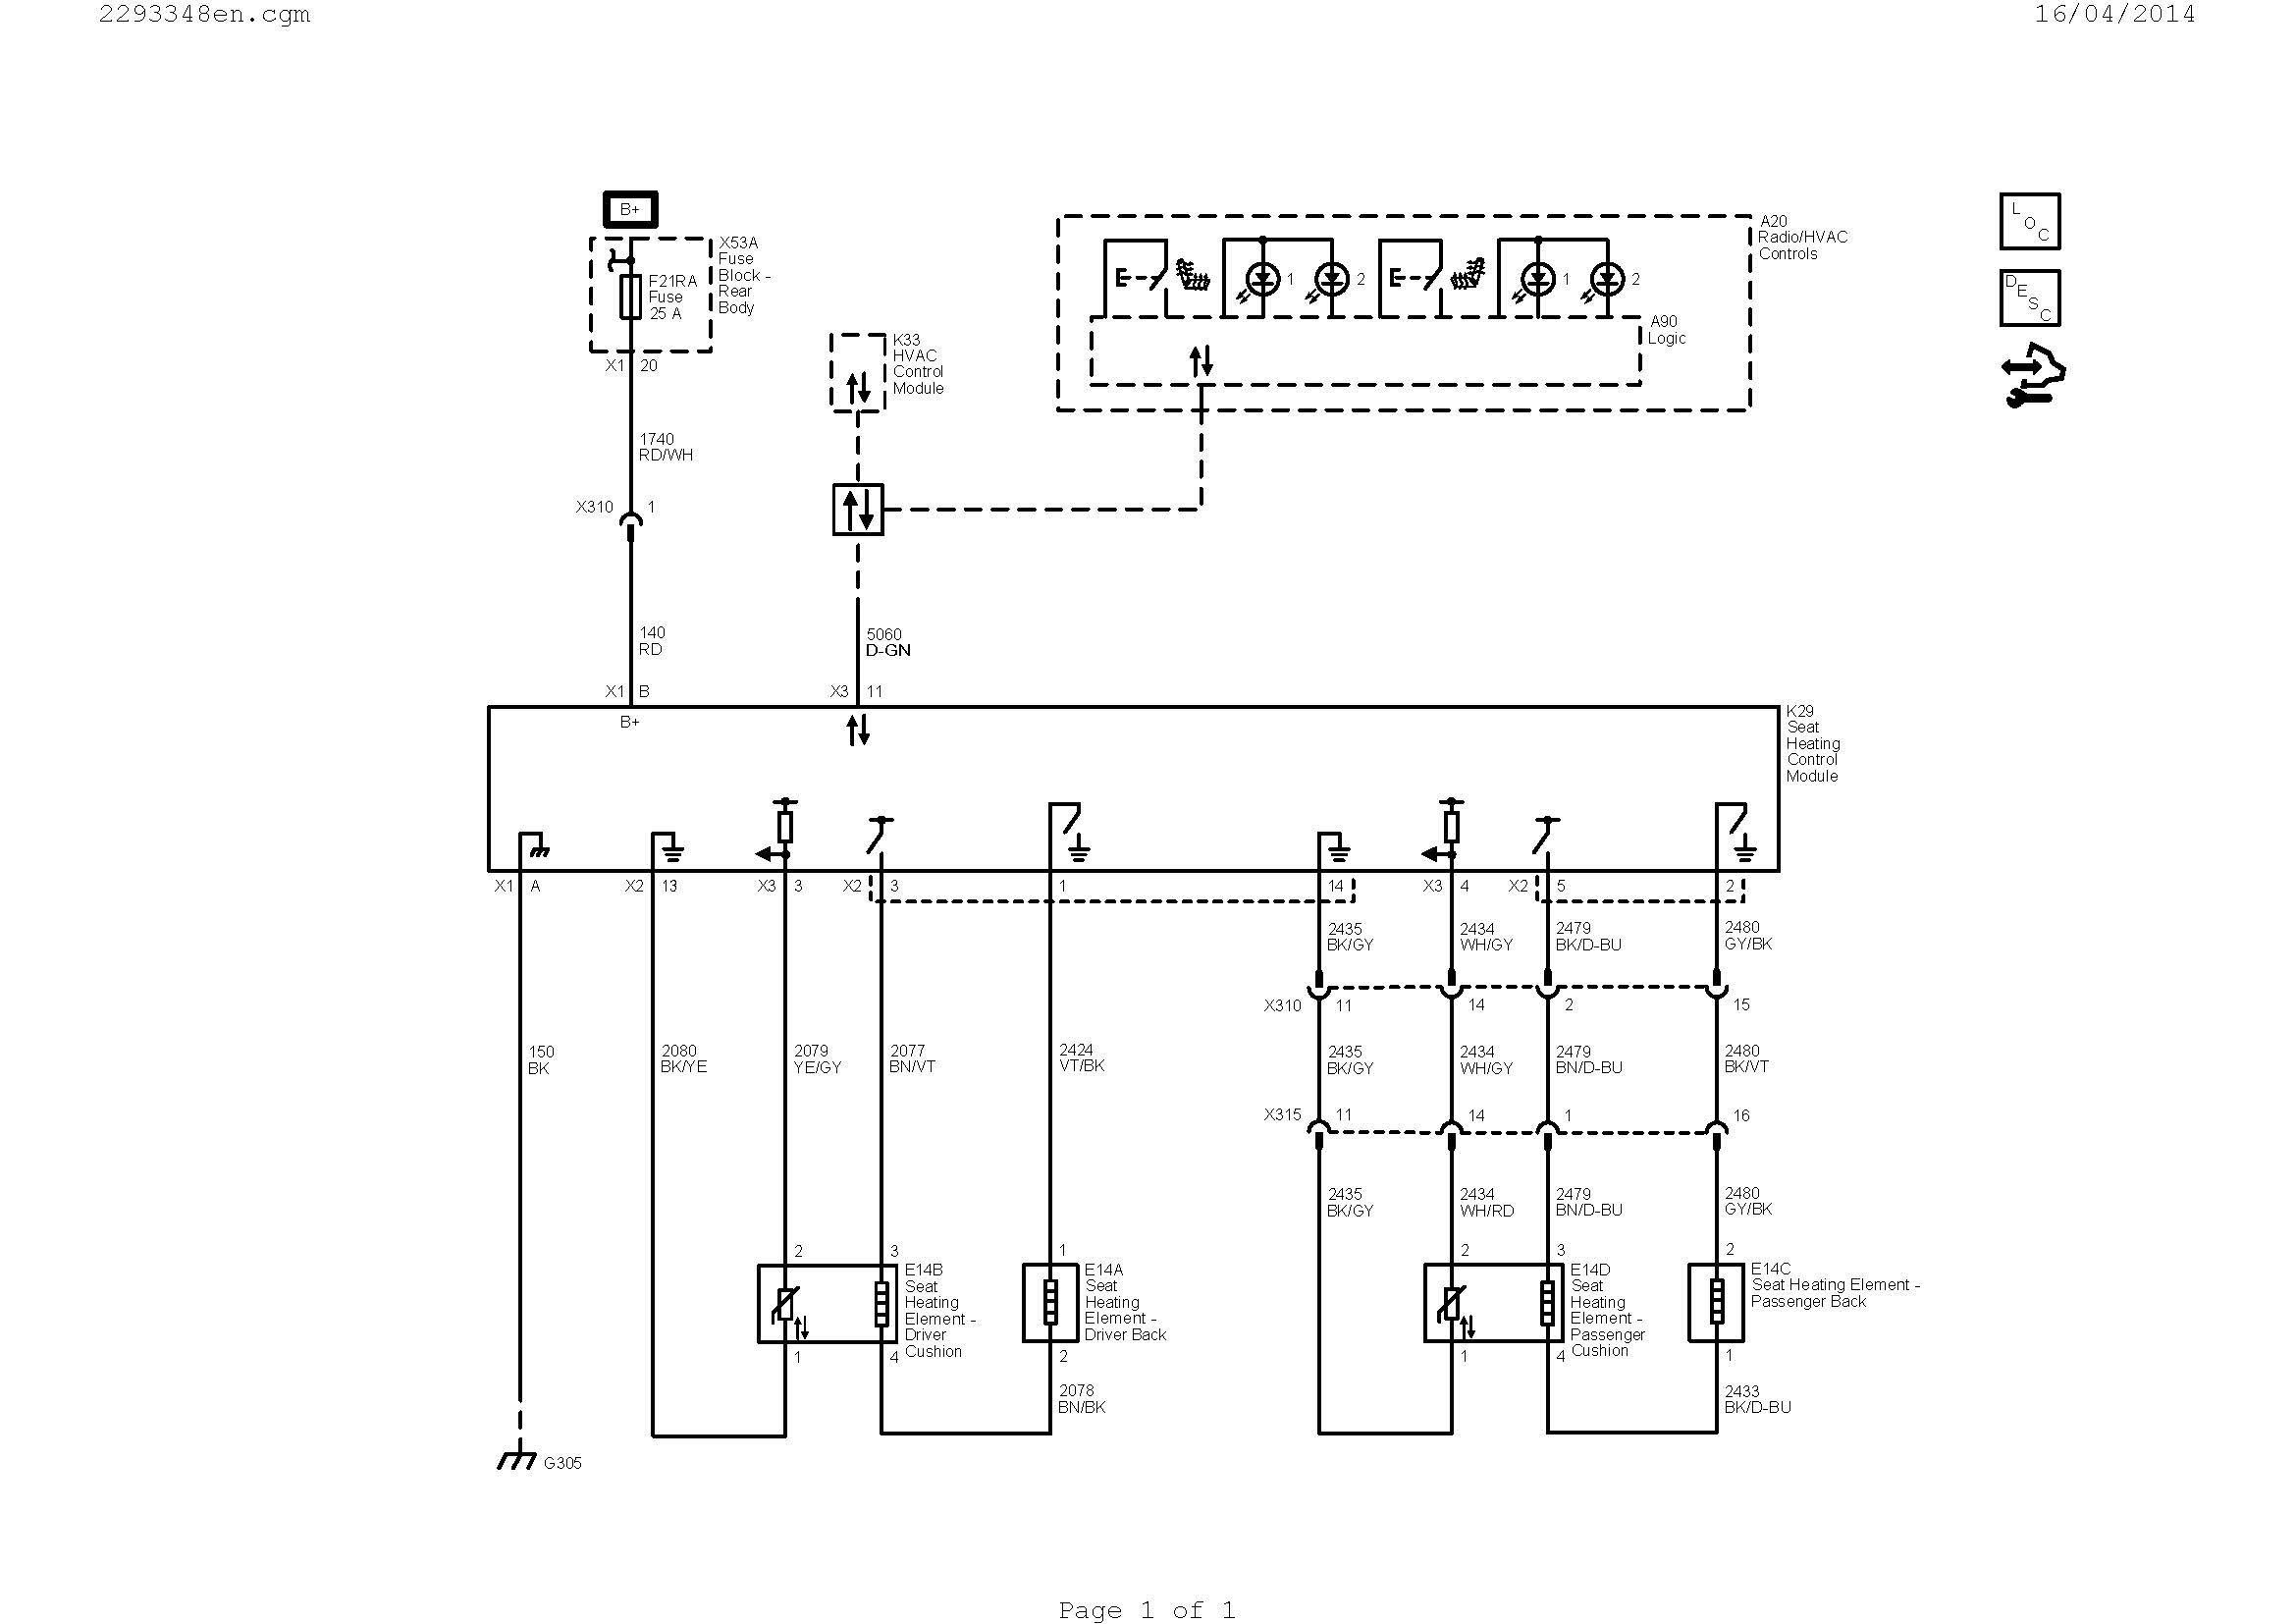 Car Alternator Diagram Bmw E83 Wiring Diagram Of Car Alternator Diagram Diagram Of G Clamp – Electrical Wiring Diagram software